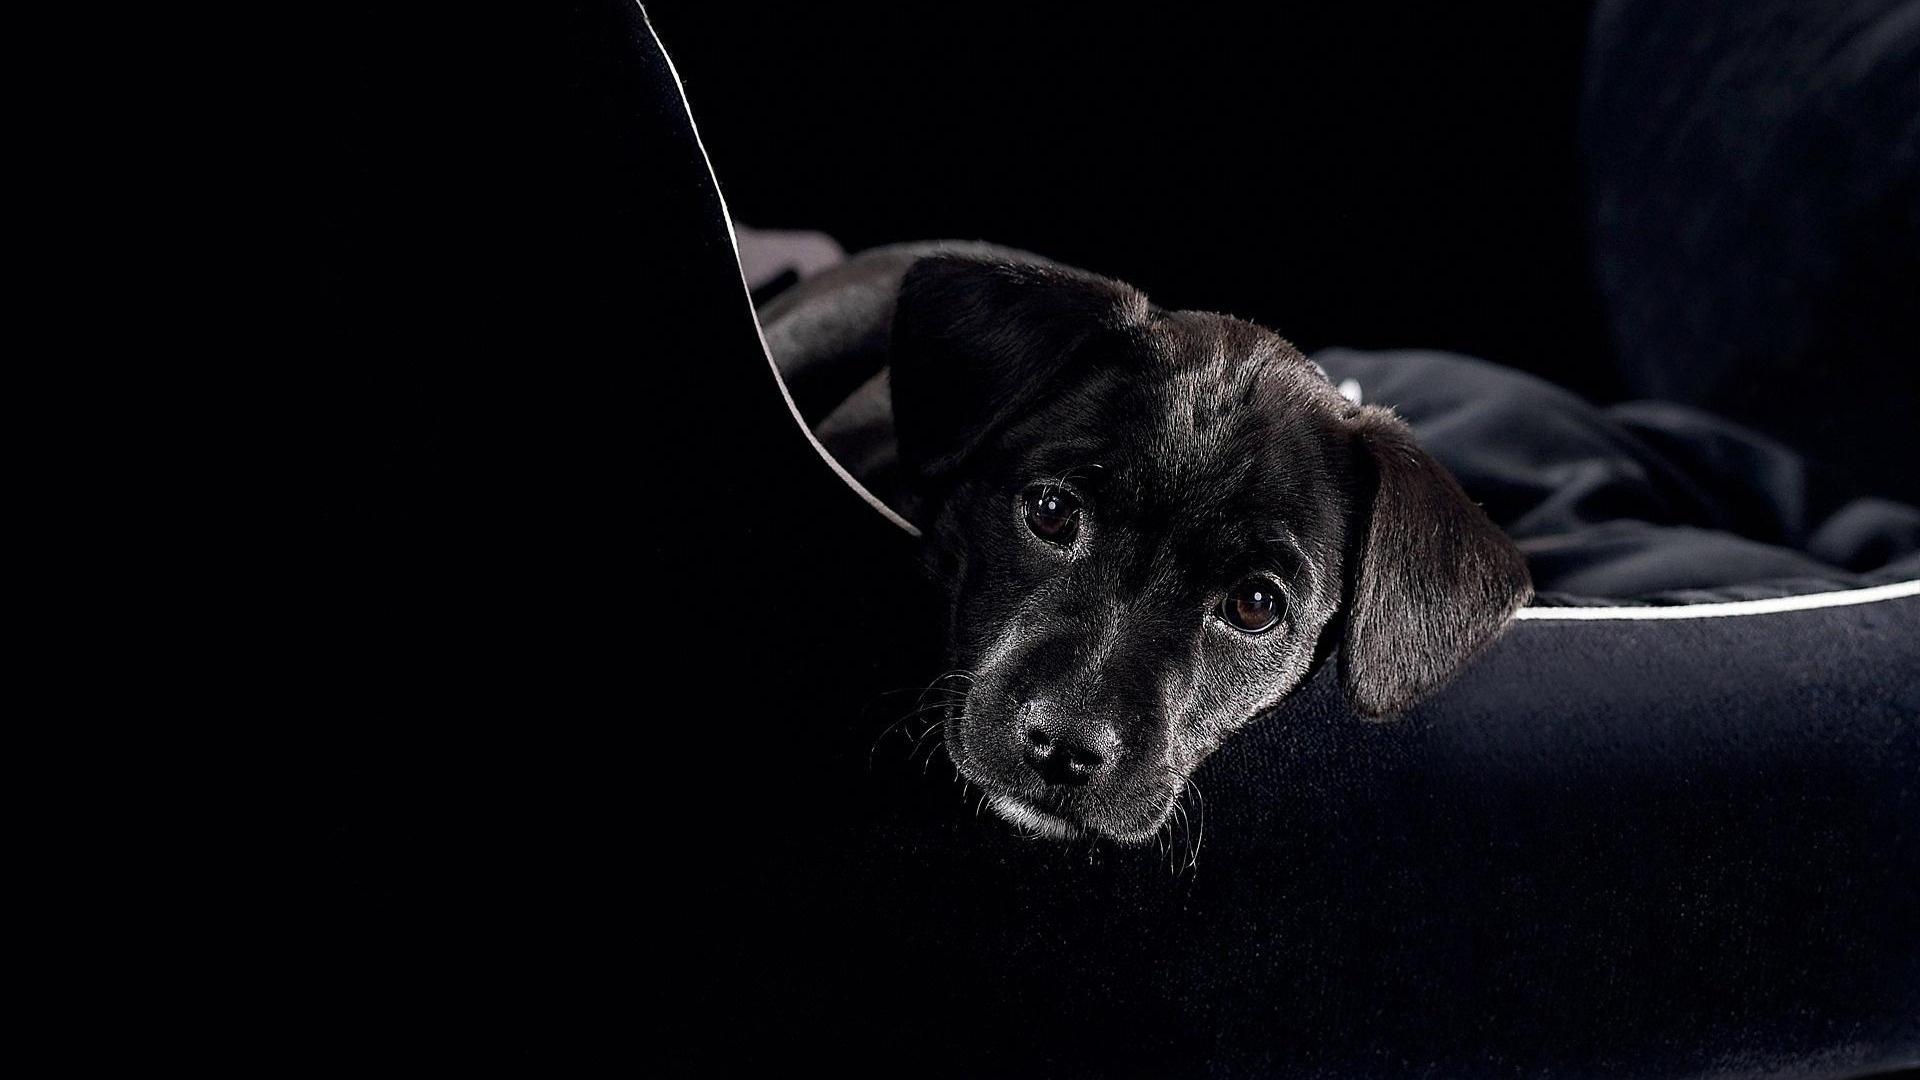 Black Labrador puppy wallpaper cute Wallpapers 3d for desktop 3d 1920x1080